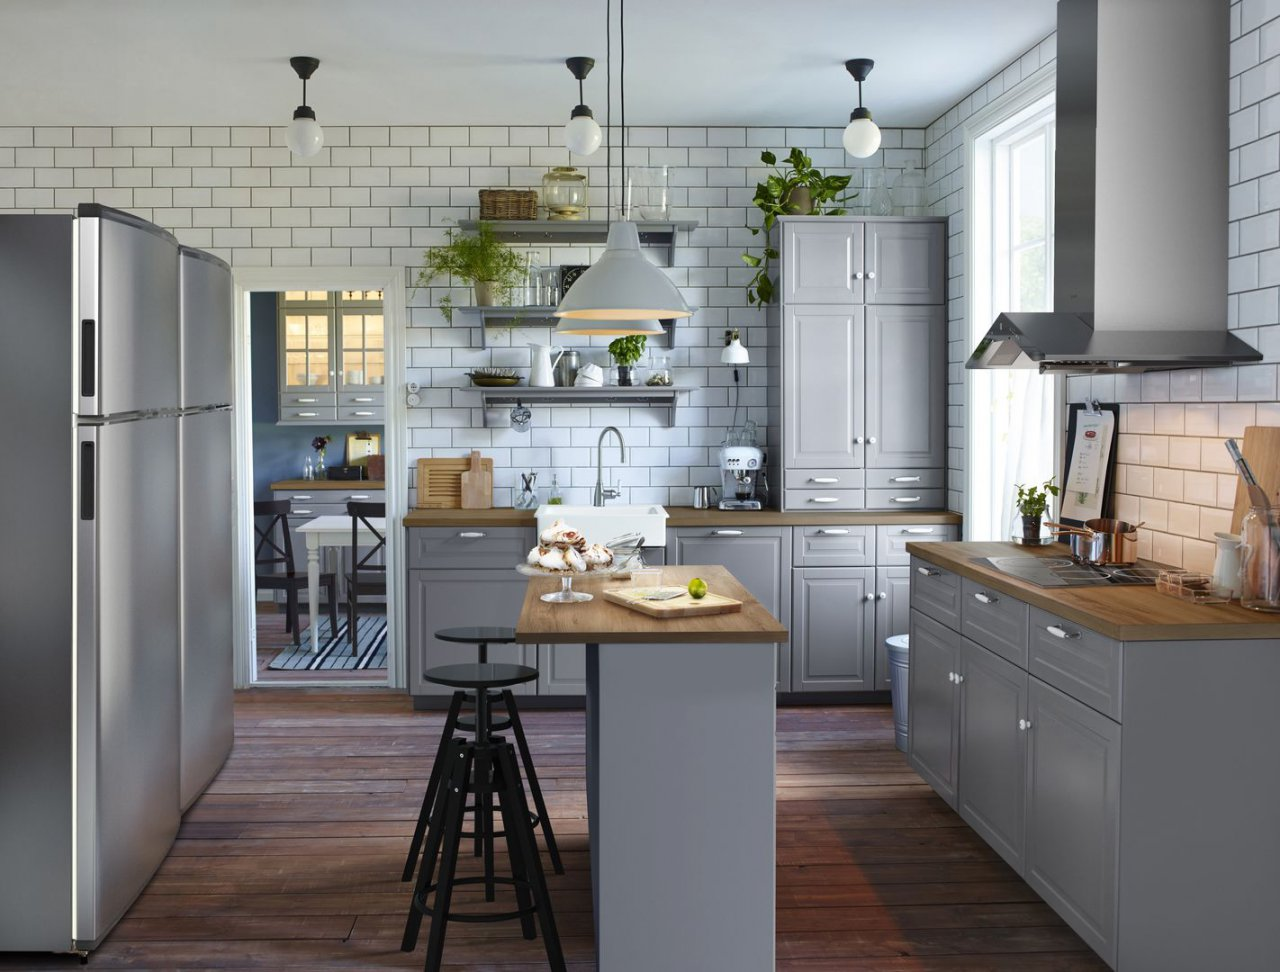 Кухонные фасады икеа метод — кухня от икеа